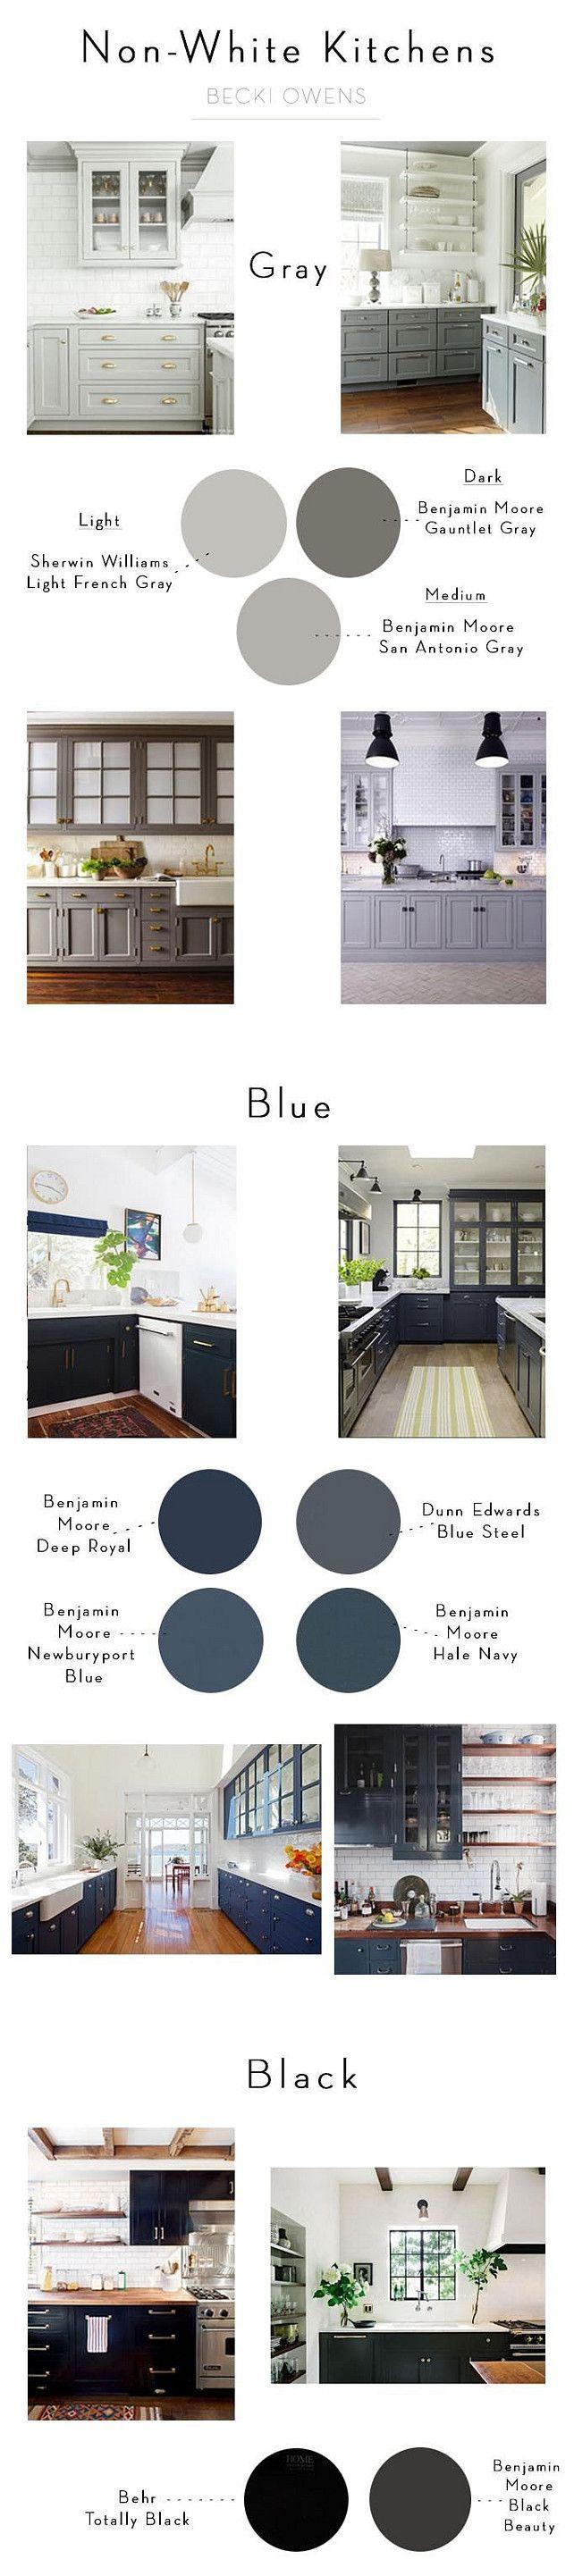 best design images on pinterest bathroom bathroom ideas and